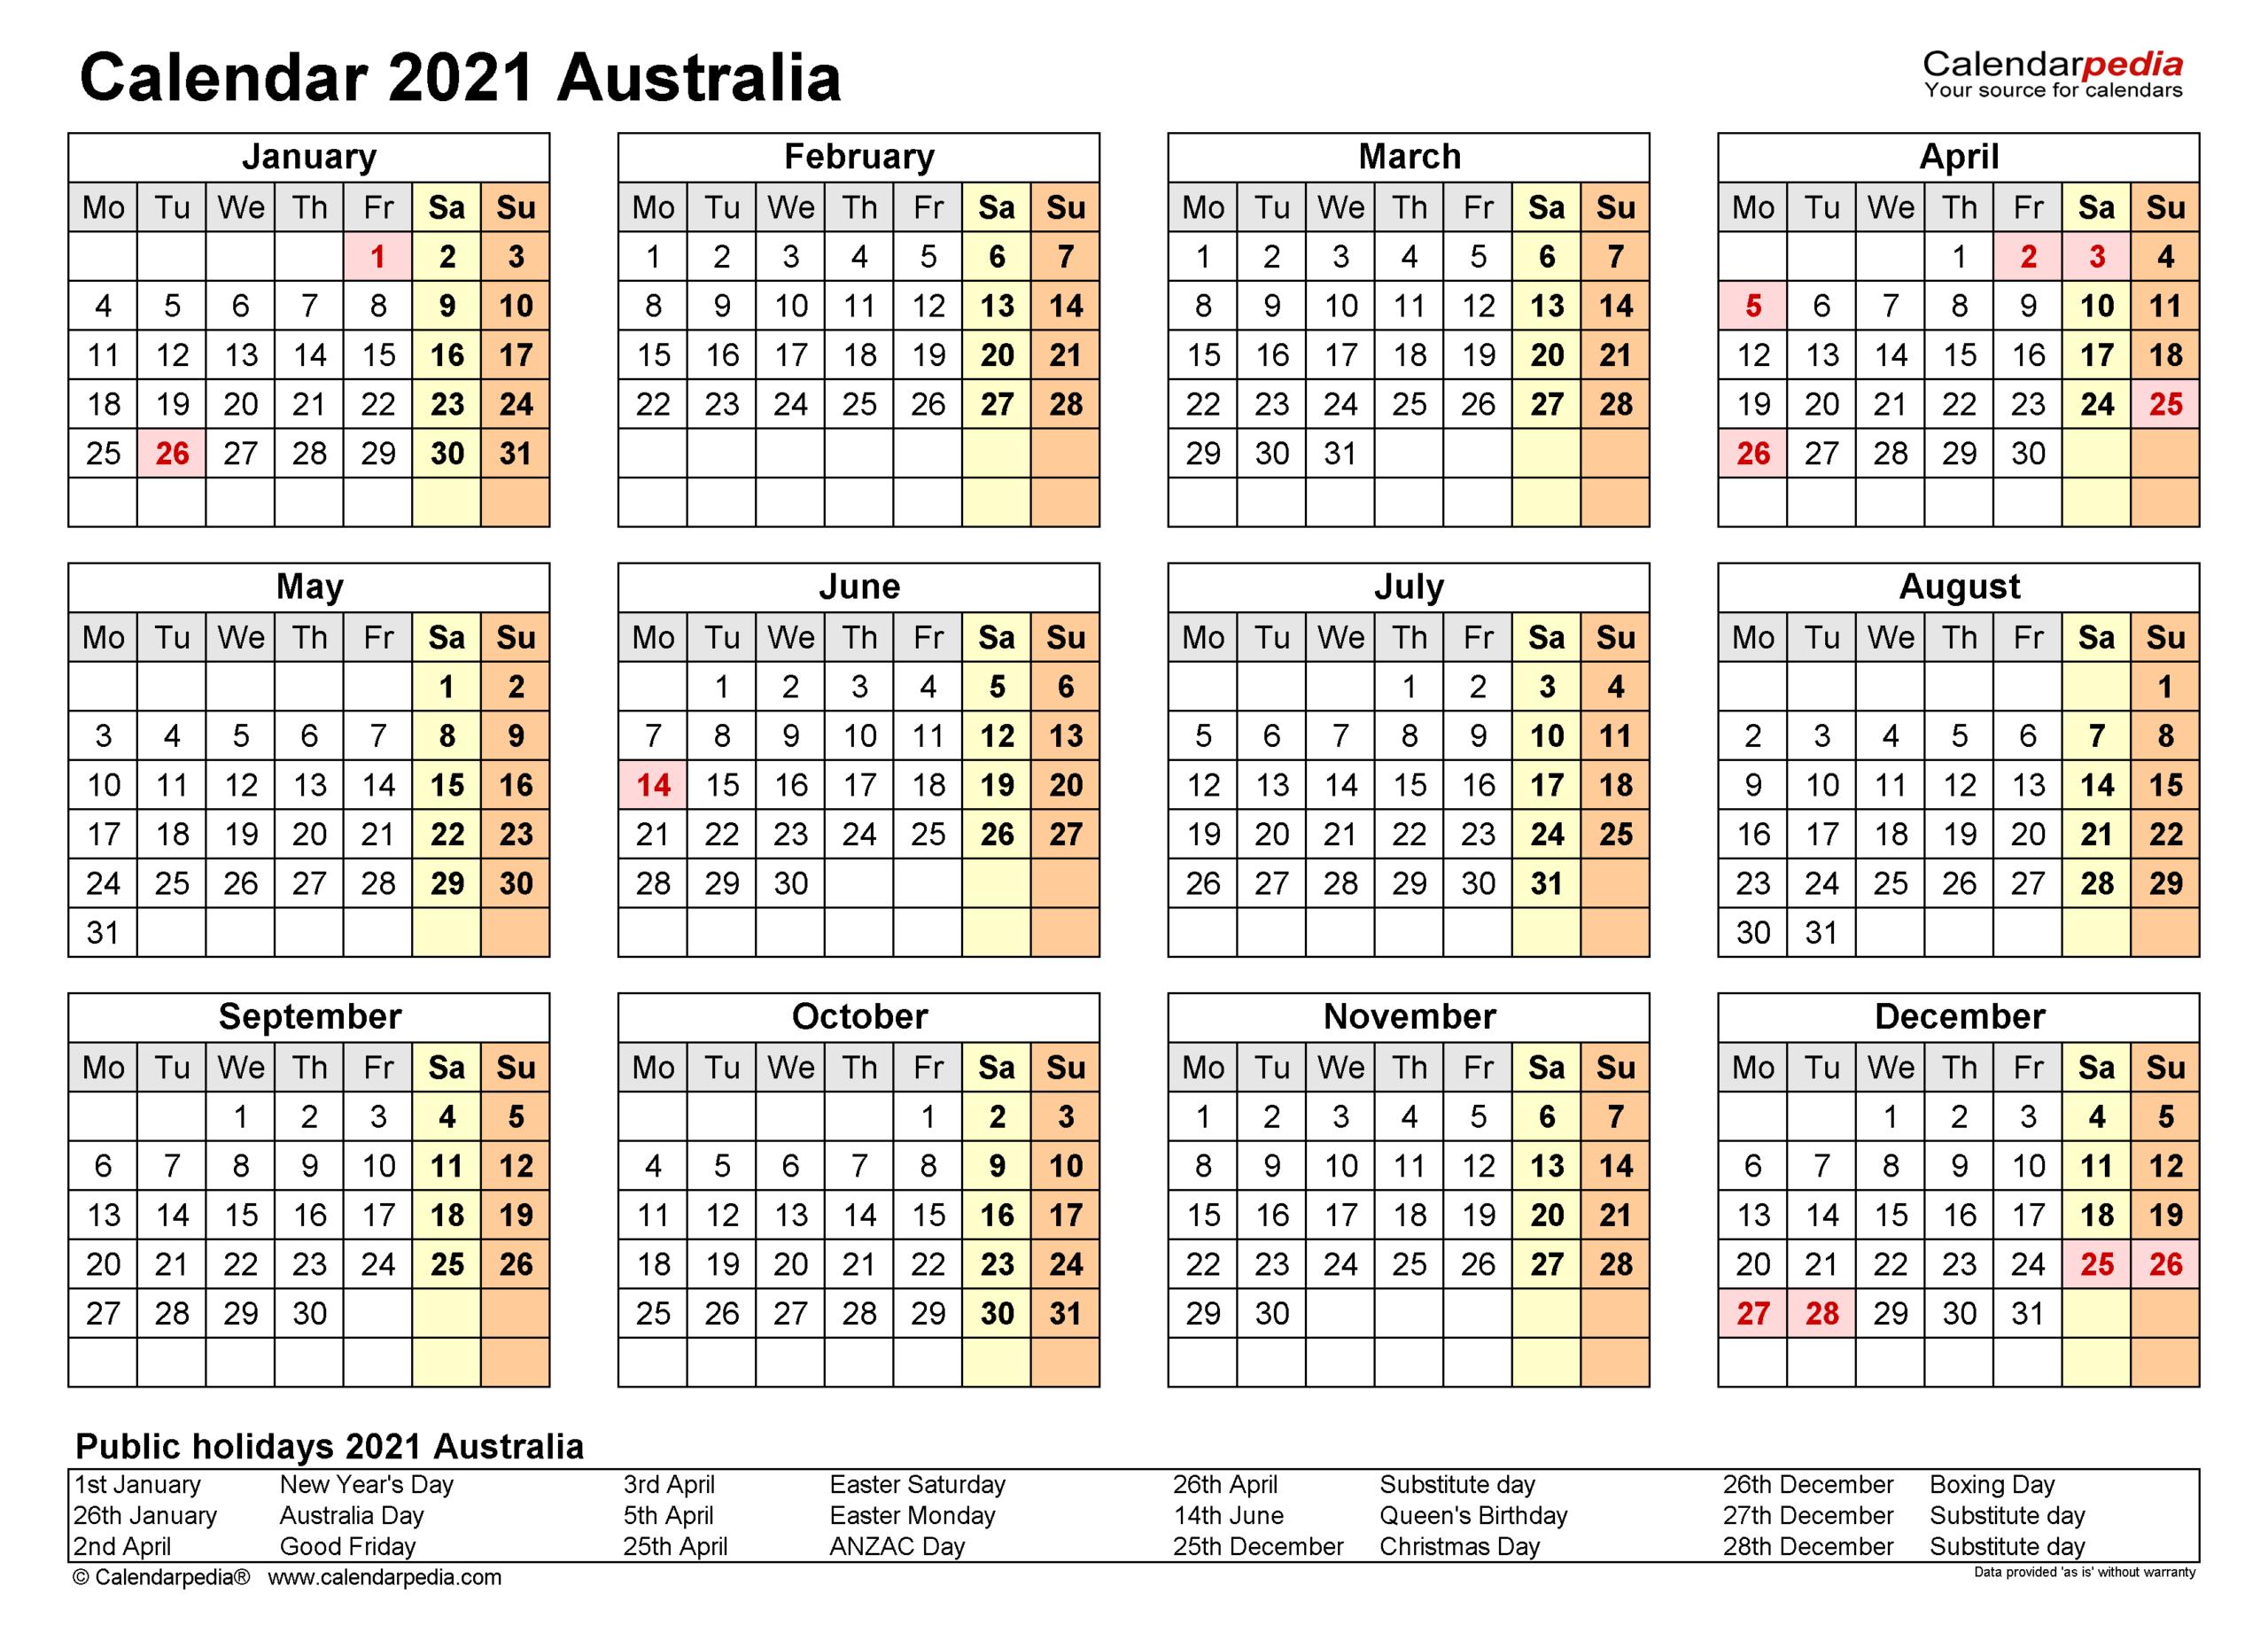 Australia Calendar 2021 - Free Printable Pdf Templates  Aus 2021-2021 Financial Year Period